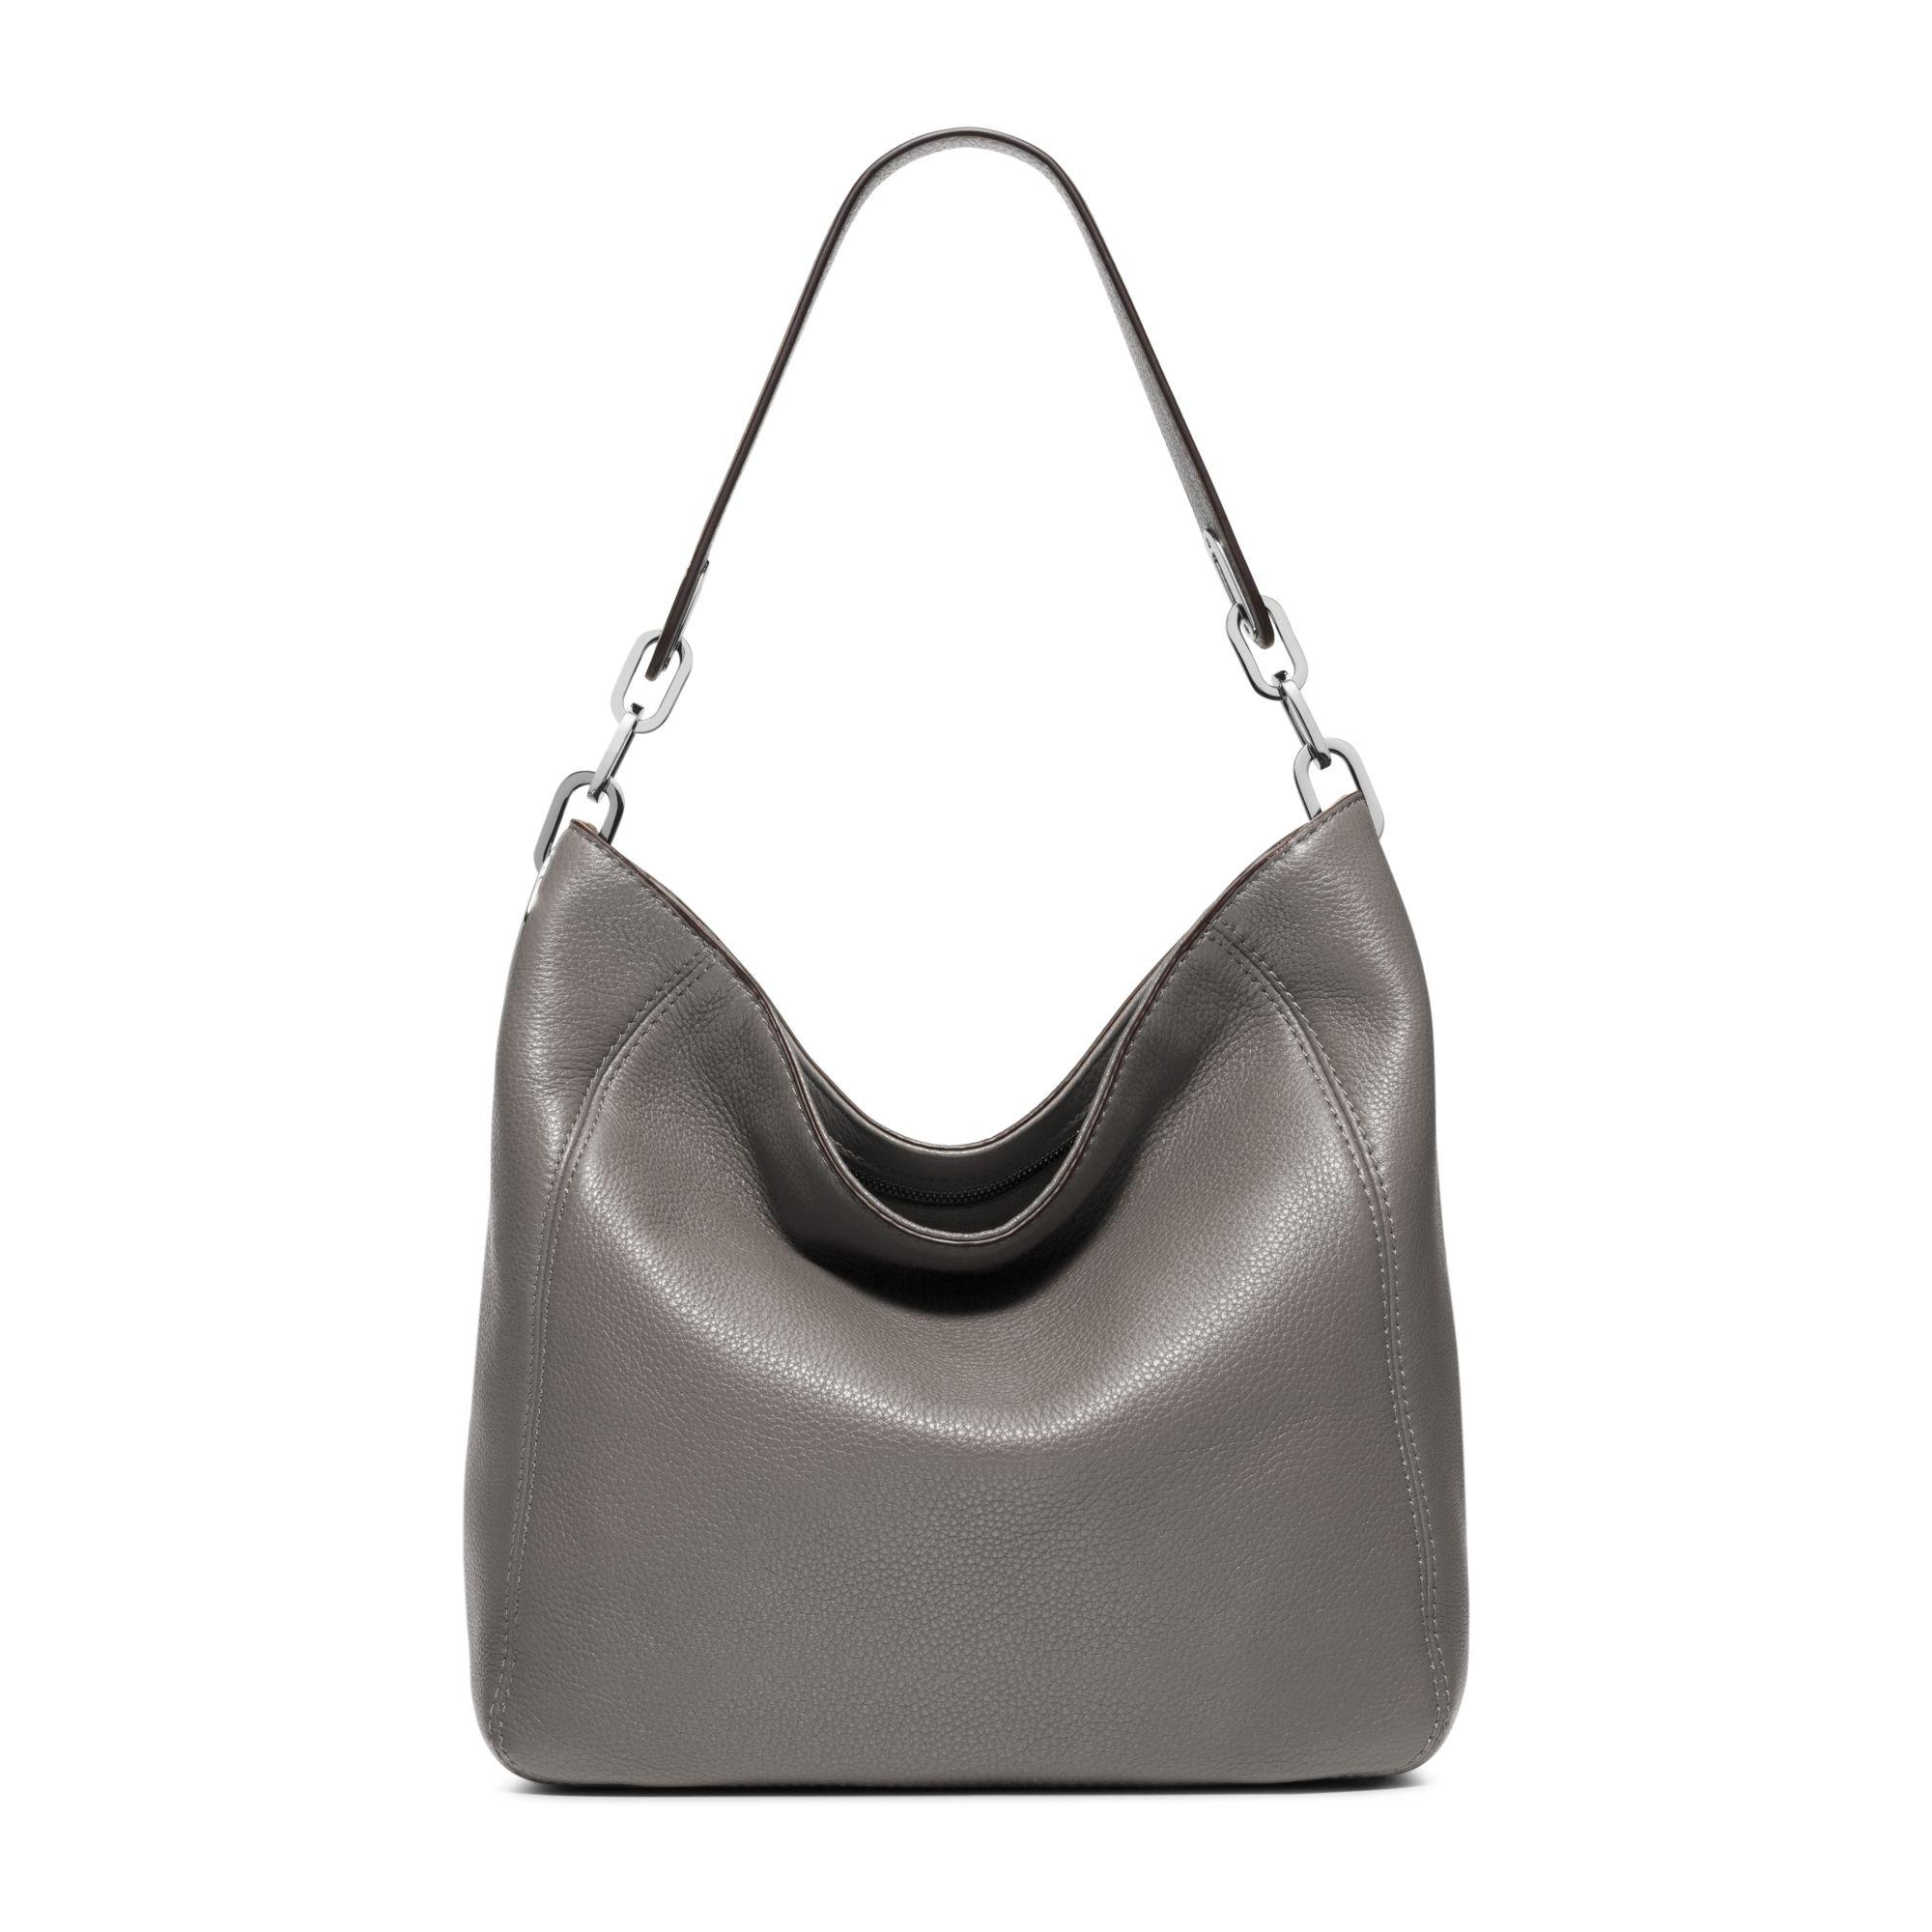 lyst michael kors fulton medium leather shoulder bag in gray rh lyst com